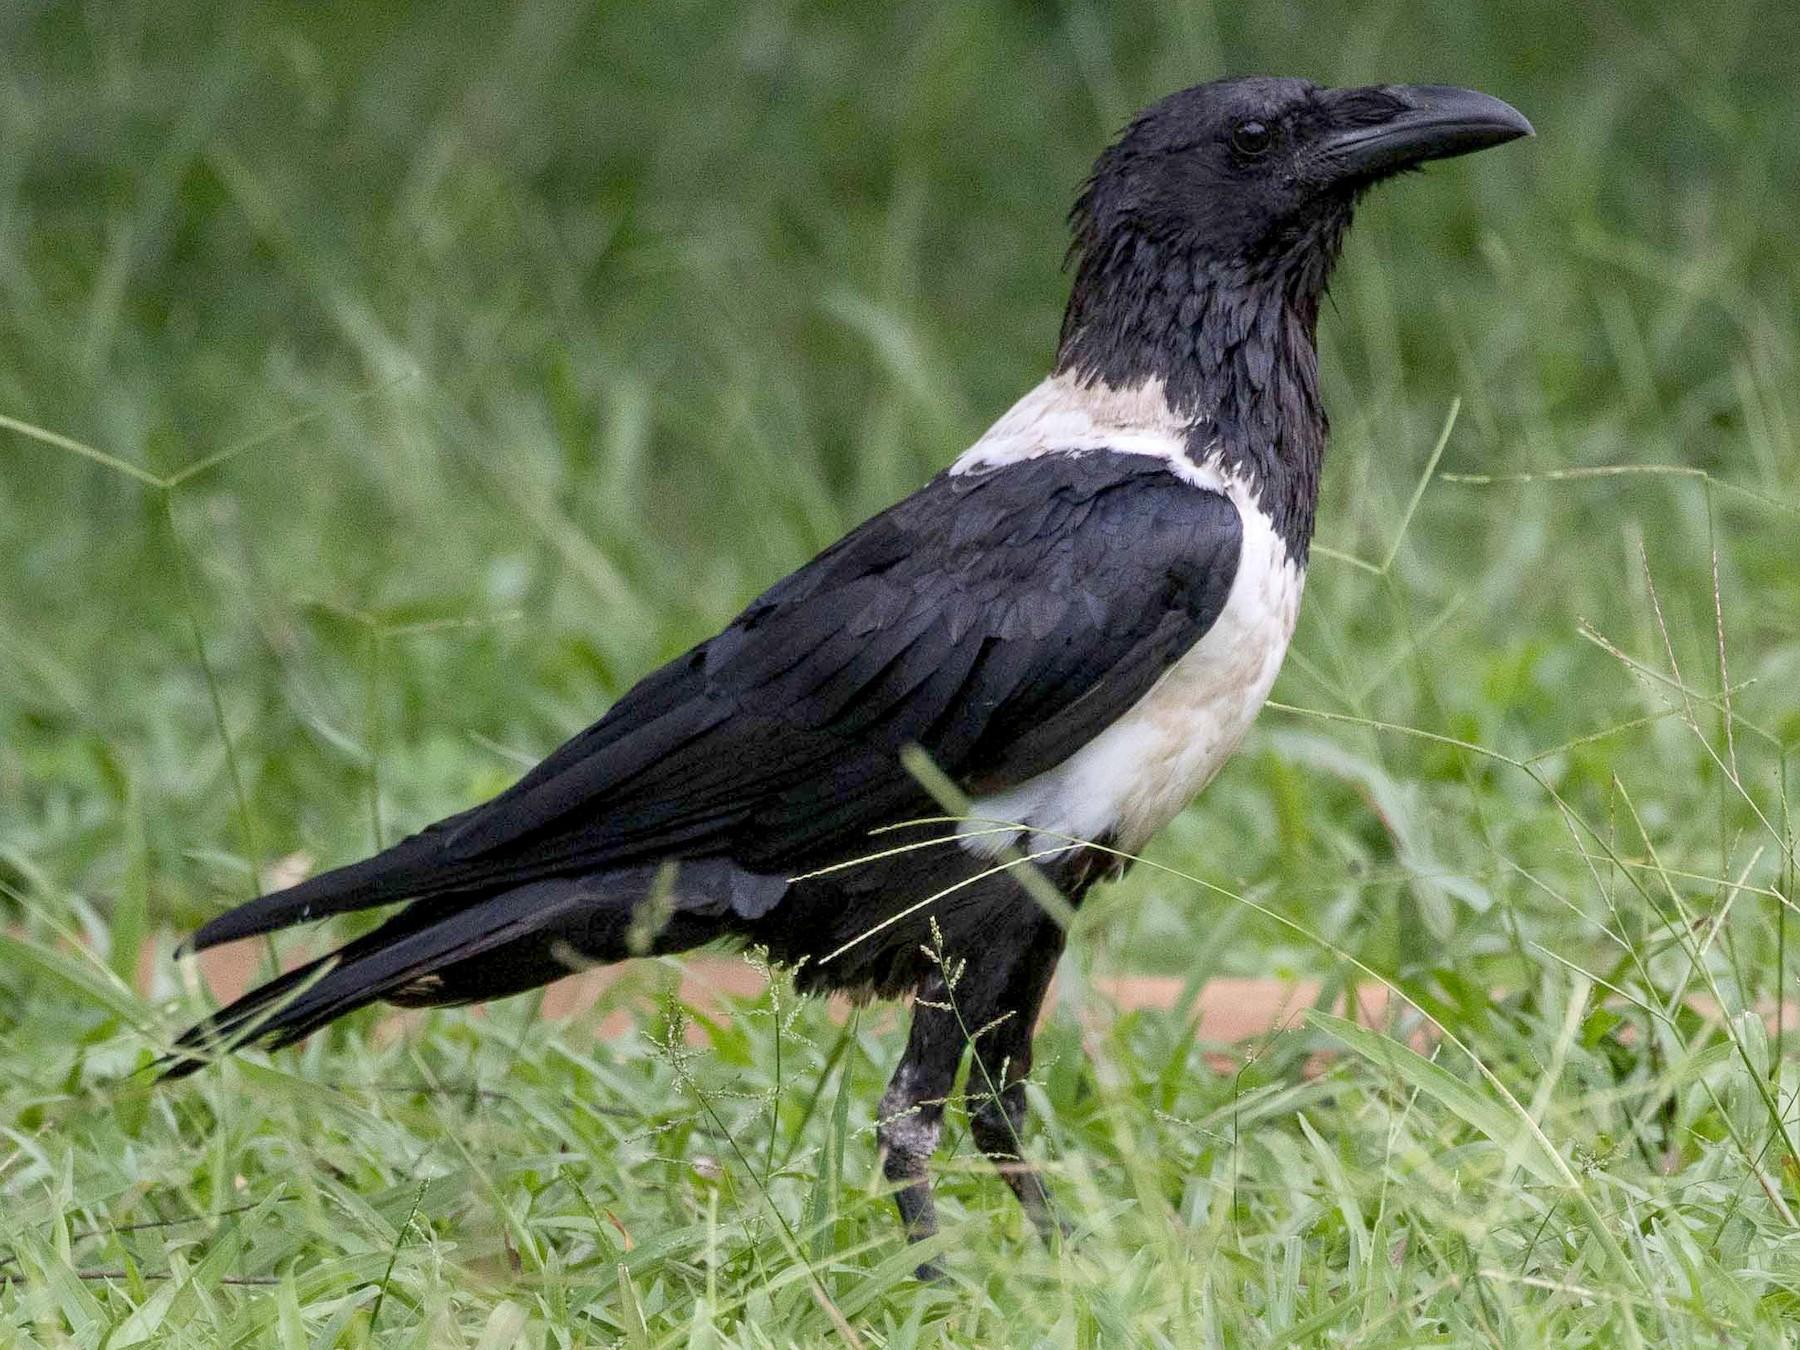 Pied Crow - Eric VanderWerf